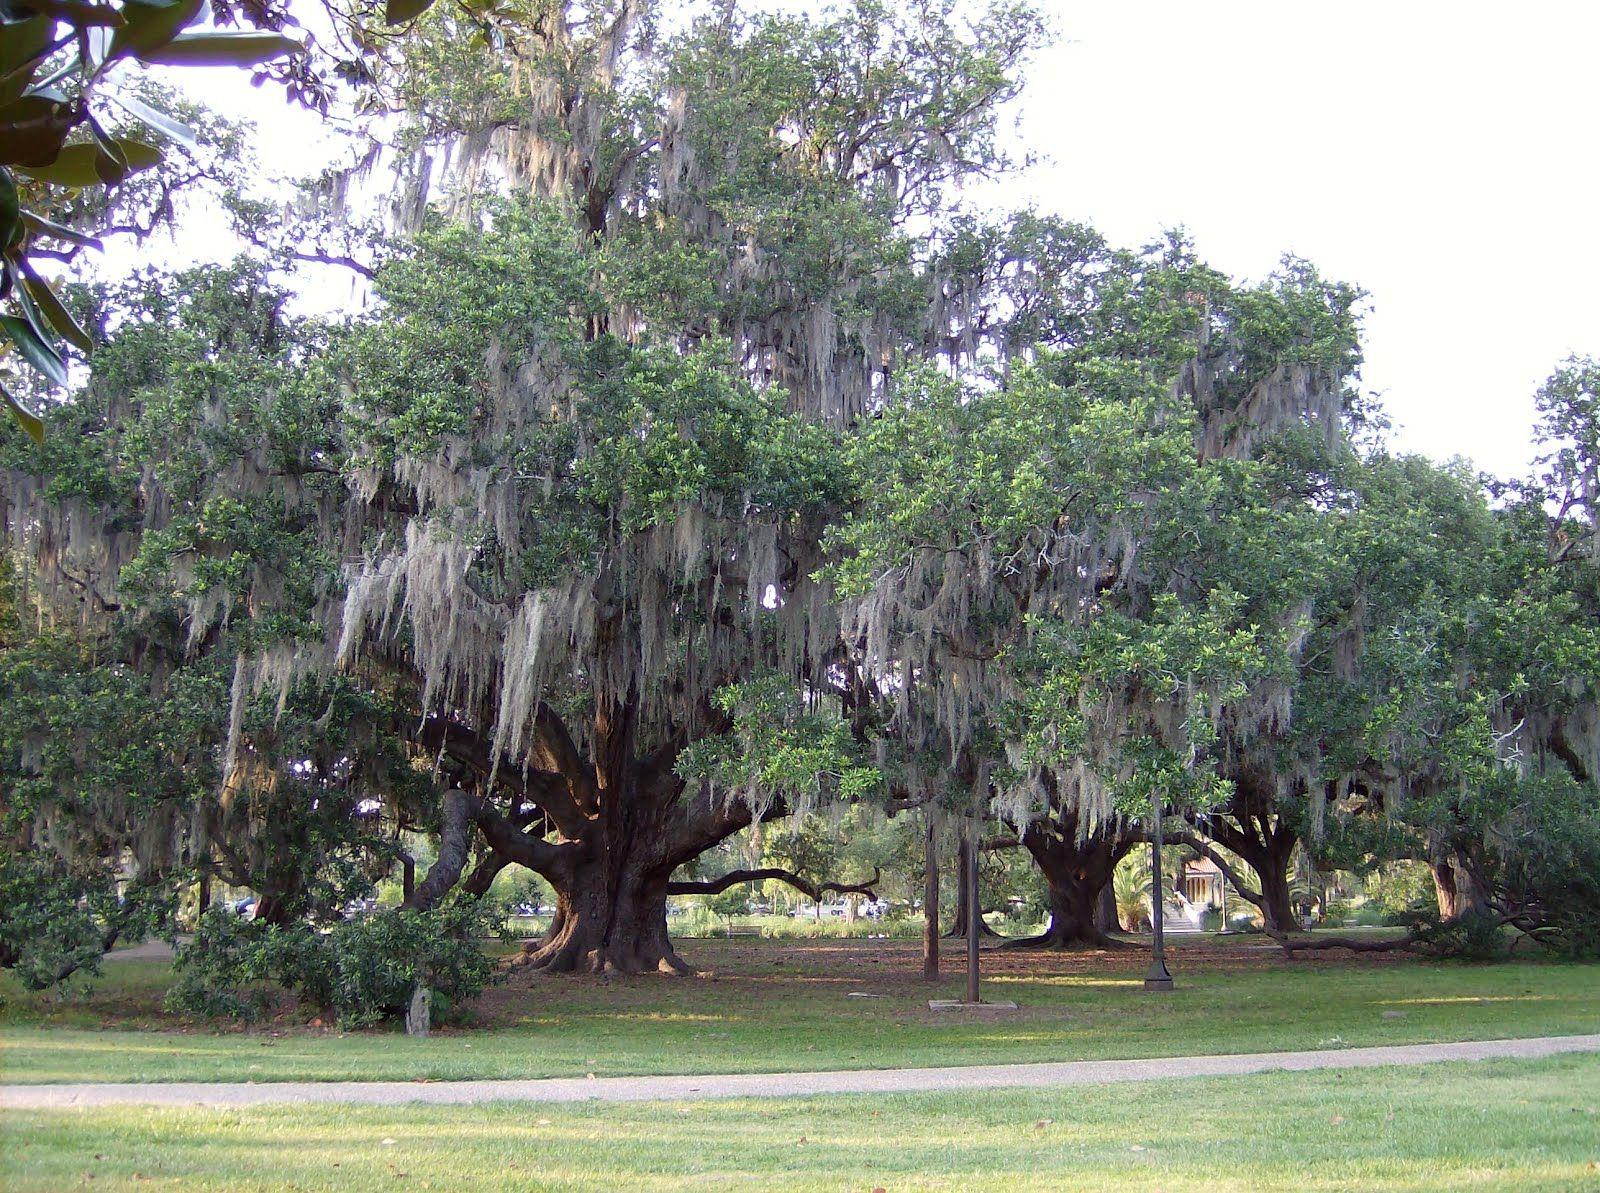 Tree Of Life New Orleans City Park Fig Street Weddings Chaplain Jerry Schwehm